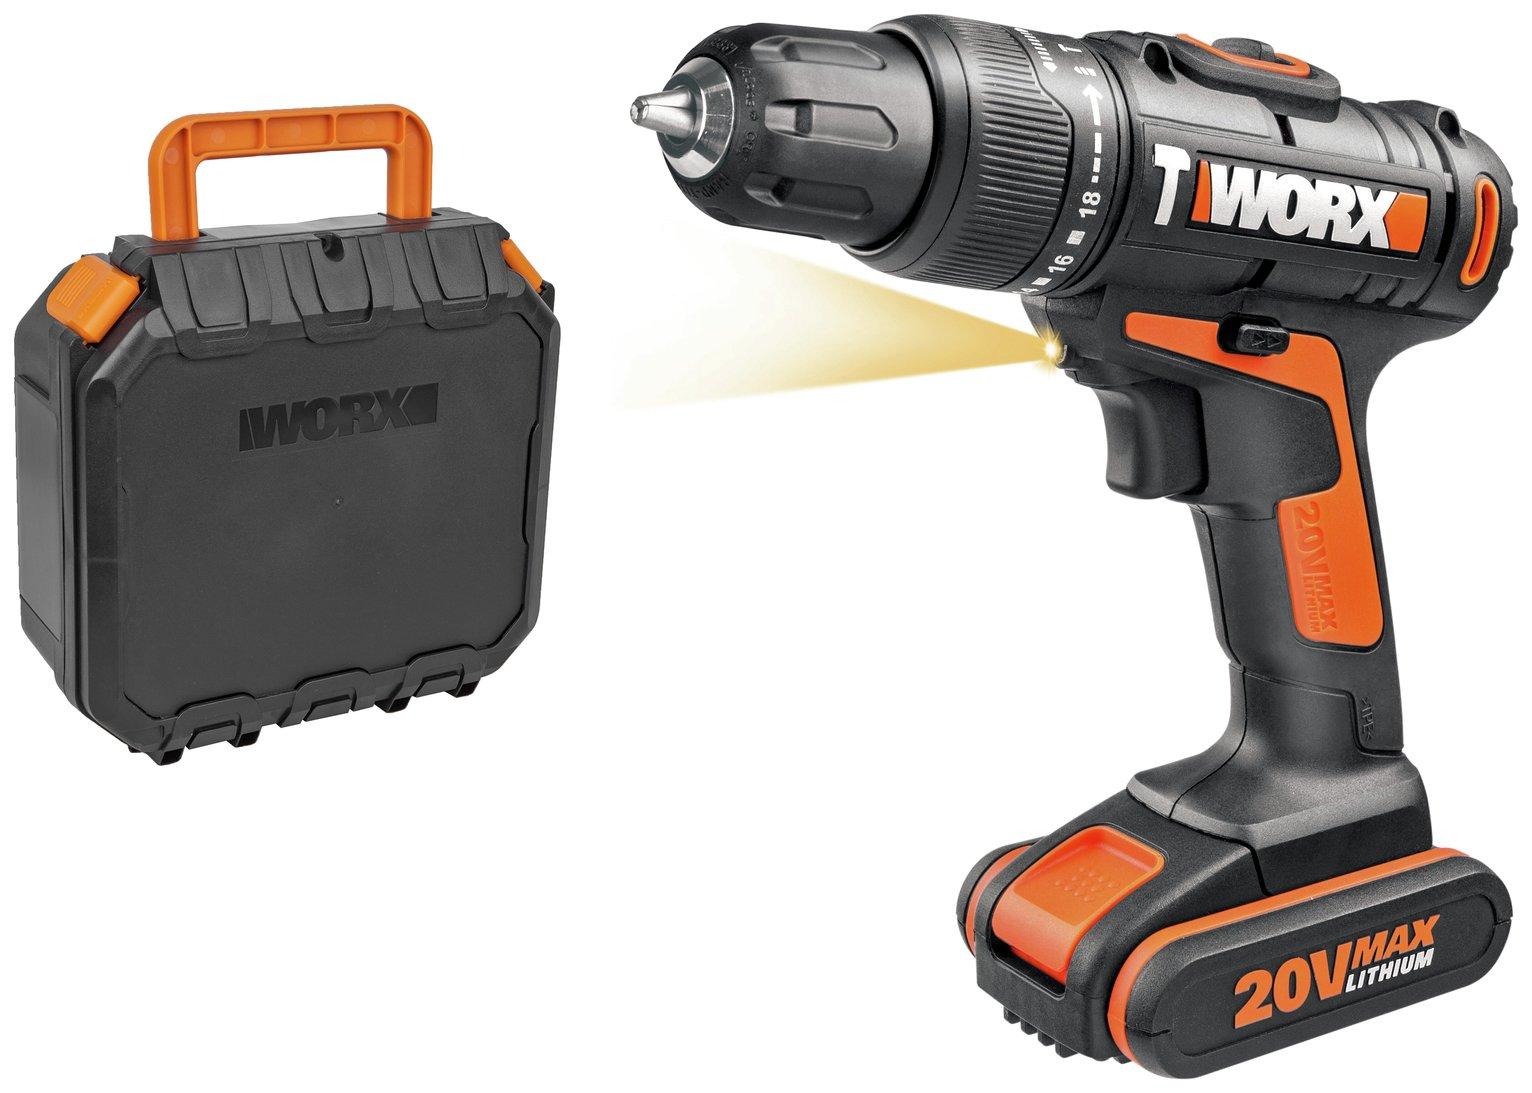 WORX WX366.2 1.5Ah Cordless Hammer Drill - 20V for £35 @ Argos (+3 yrs warranty)